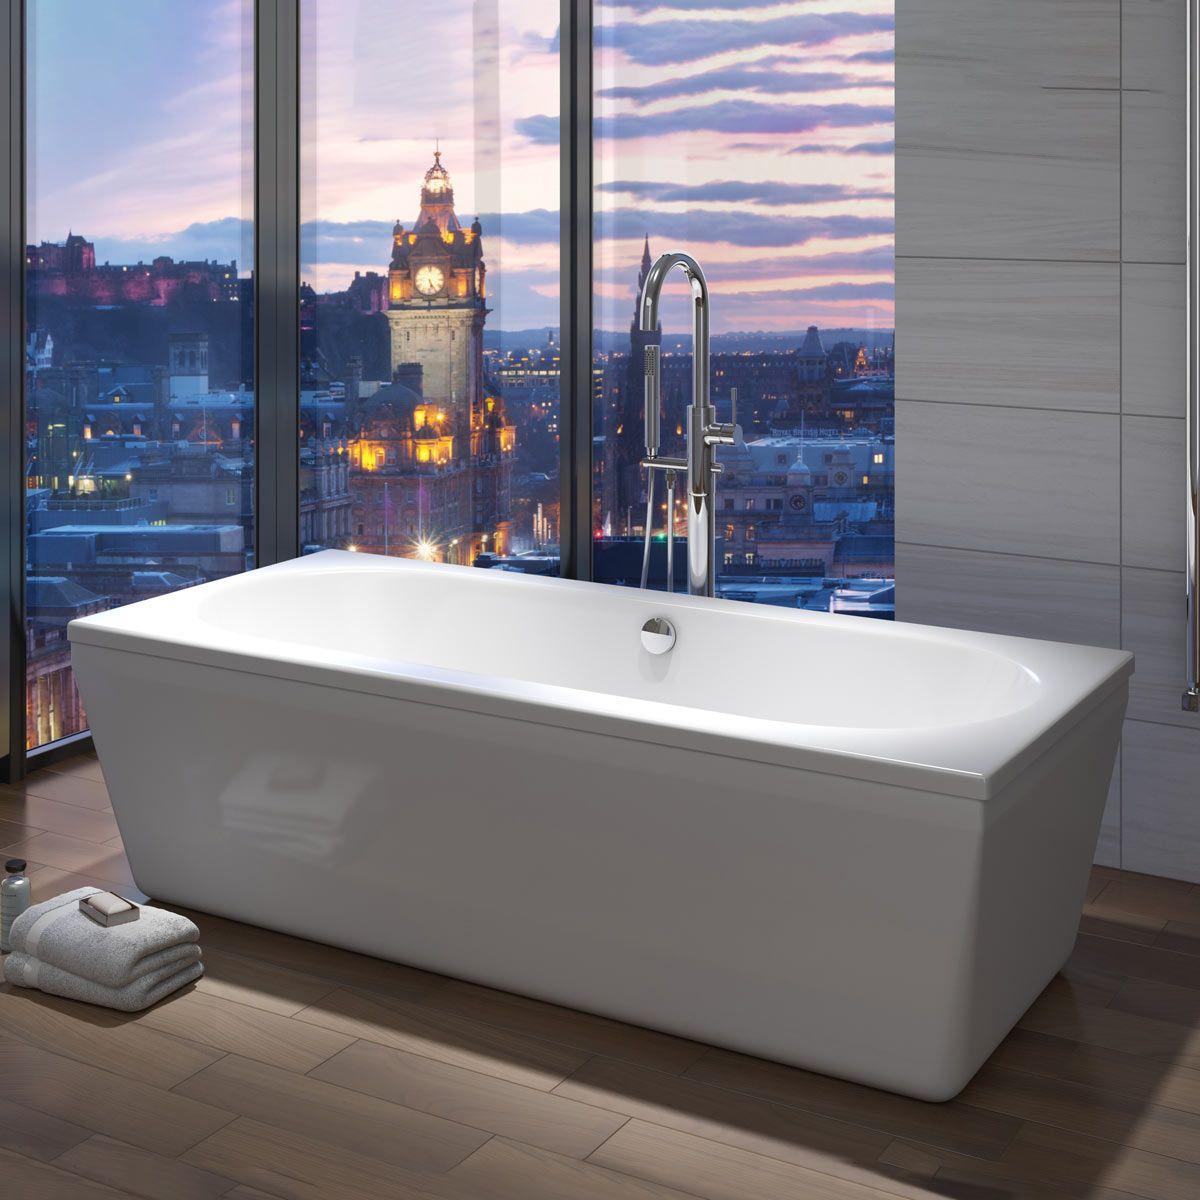 Trojan Edinburgh Freestanding Double Ended Bath 1800 X 800mm